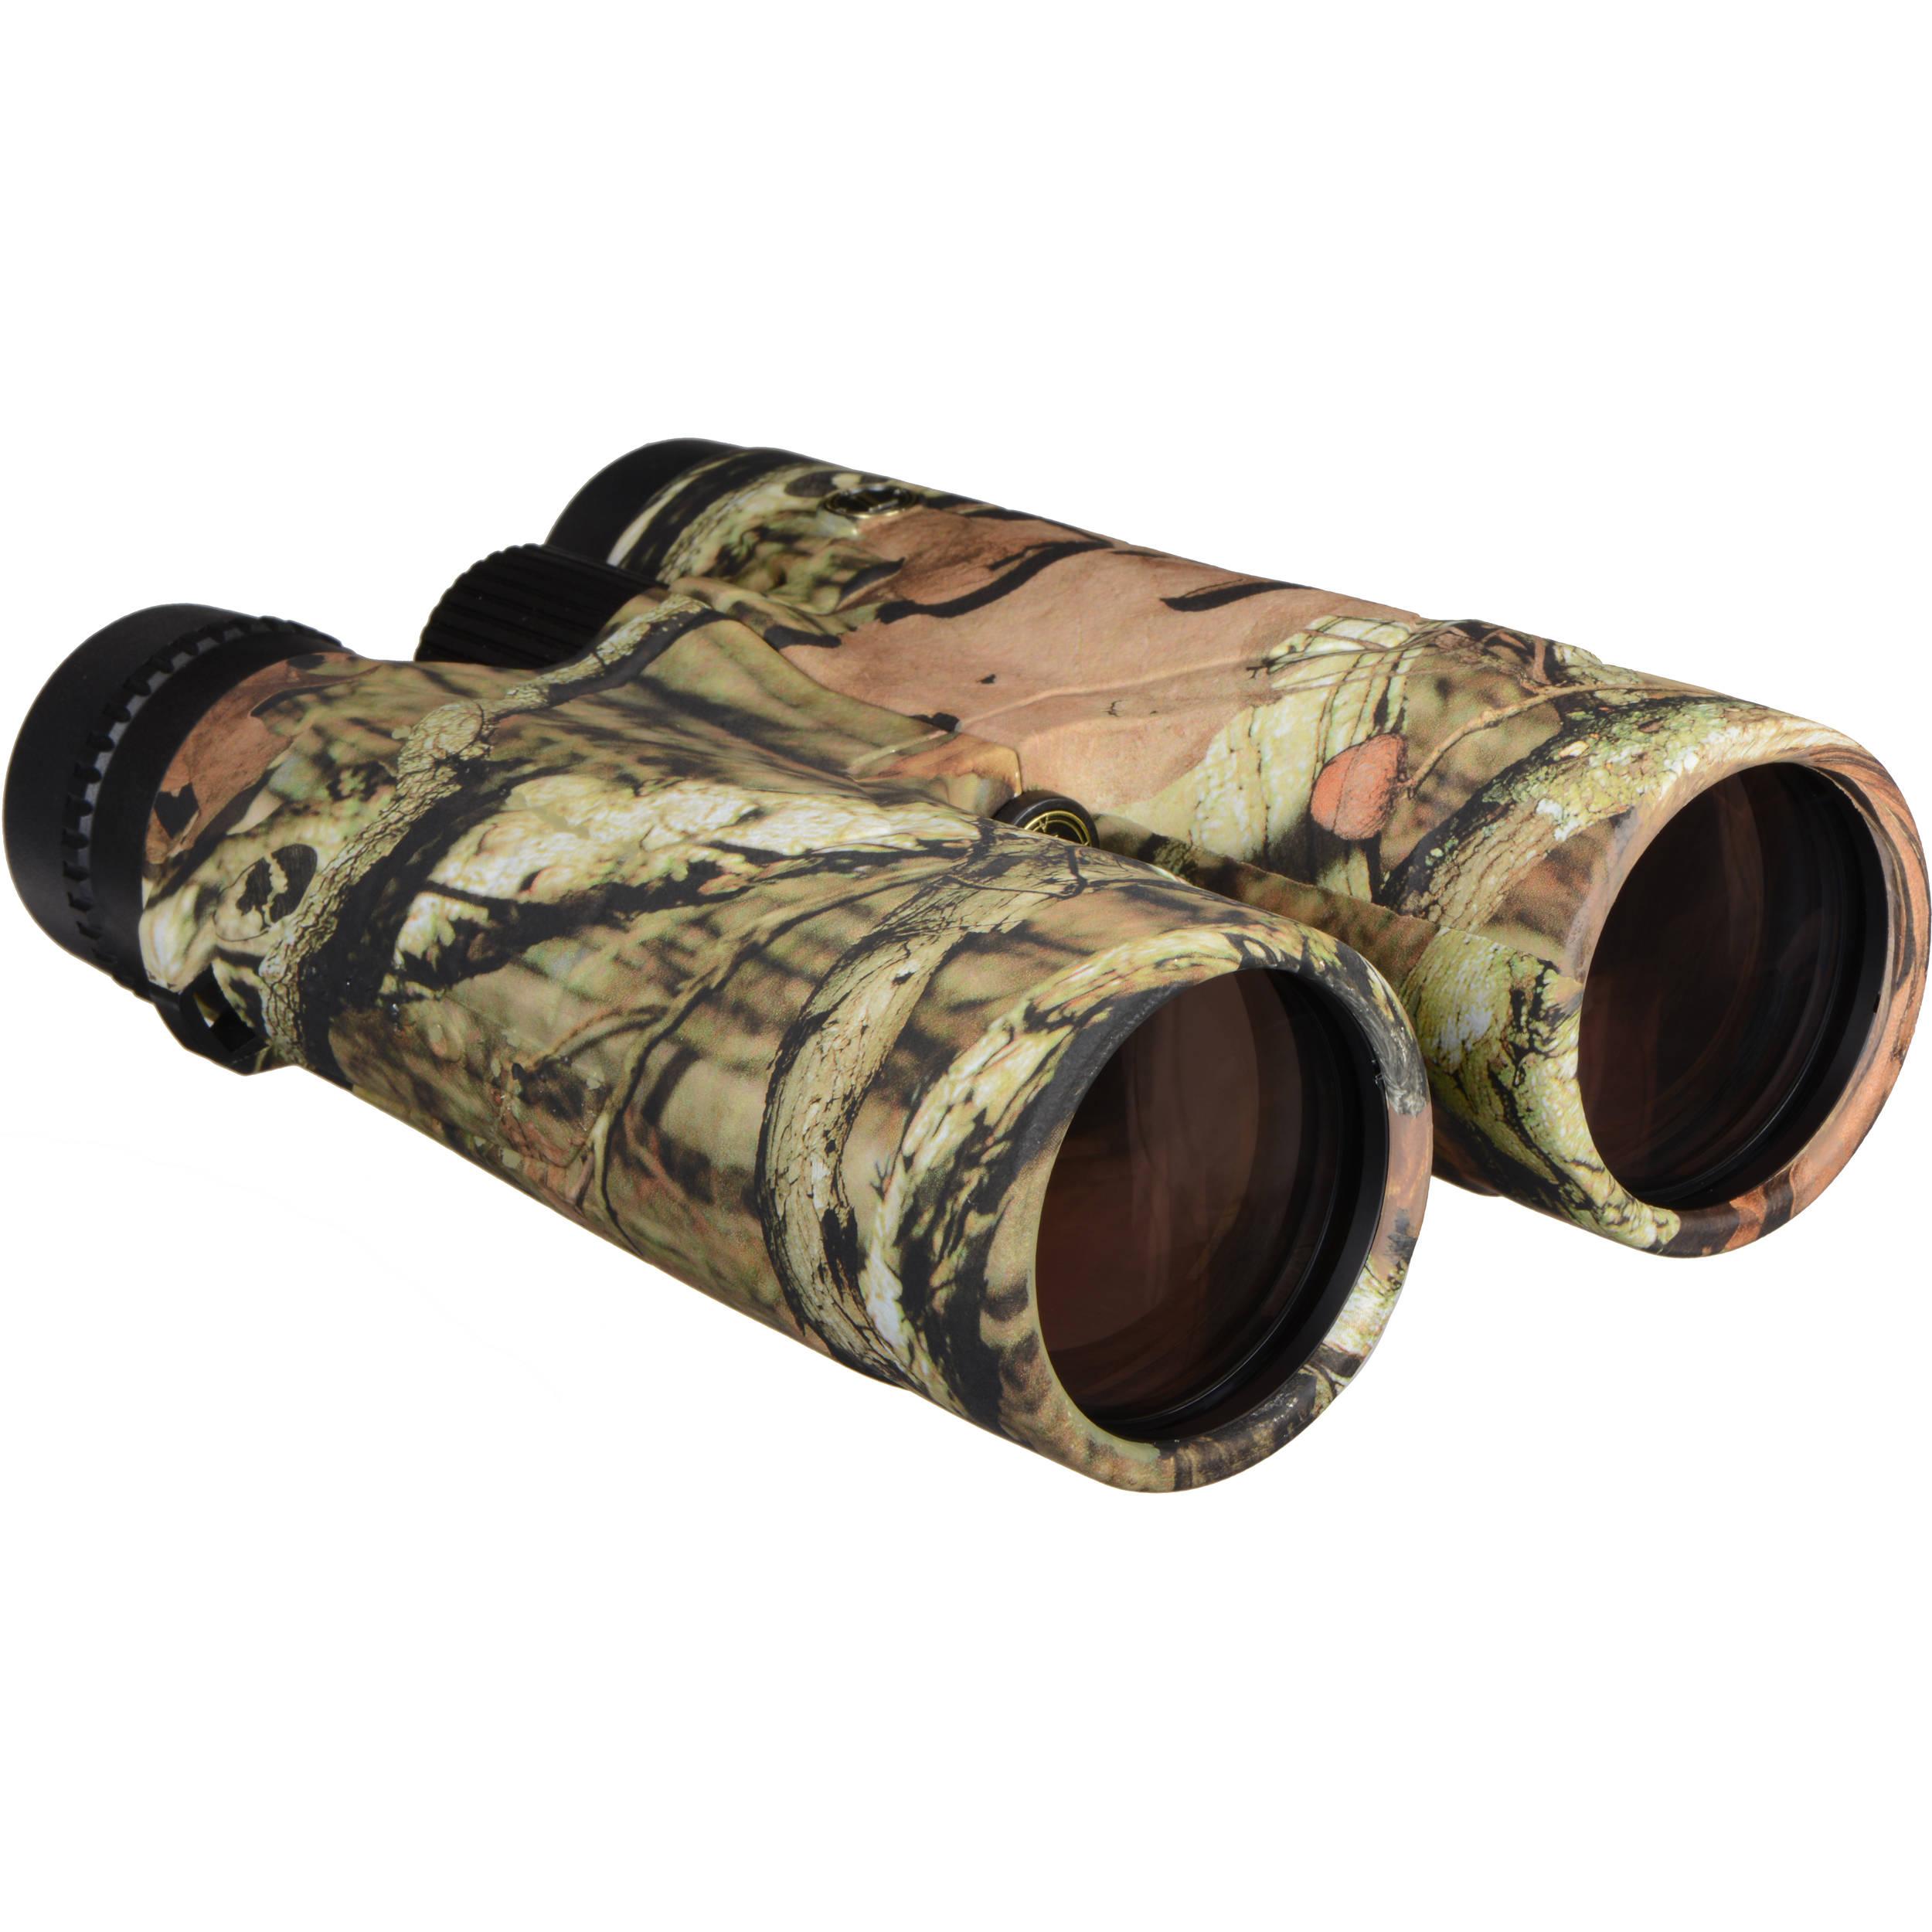 Leupold 10x50 Bx 2 Acadia Binocular Mossy Oak Break Up Infinity Camo